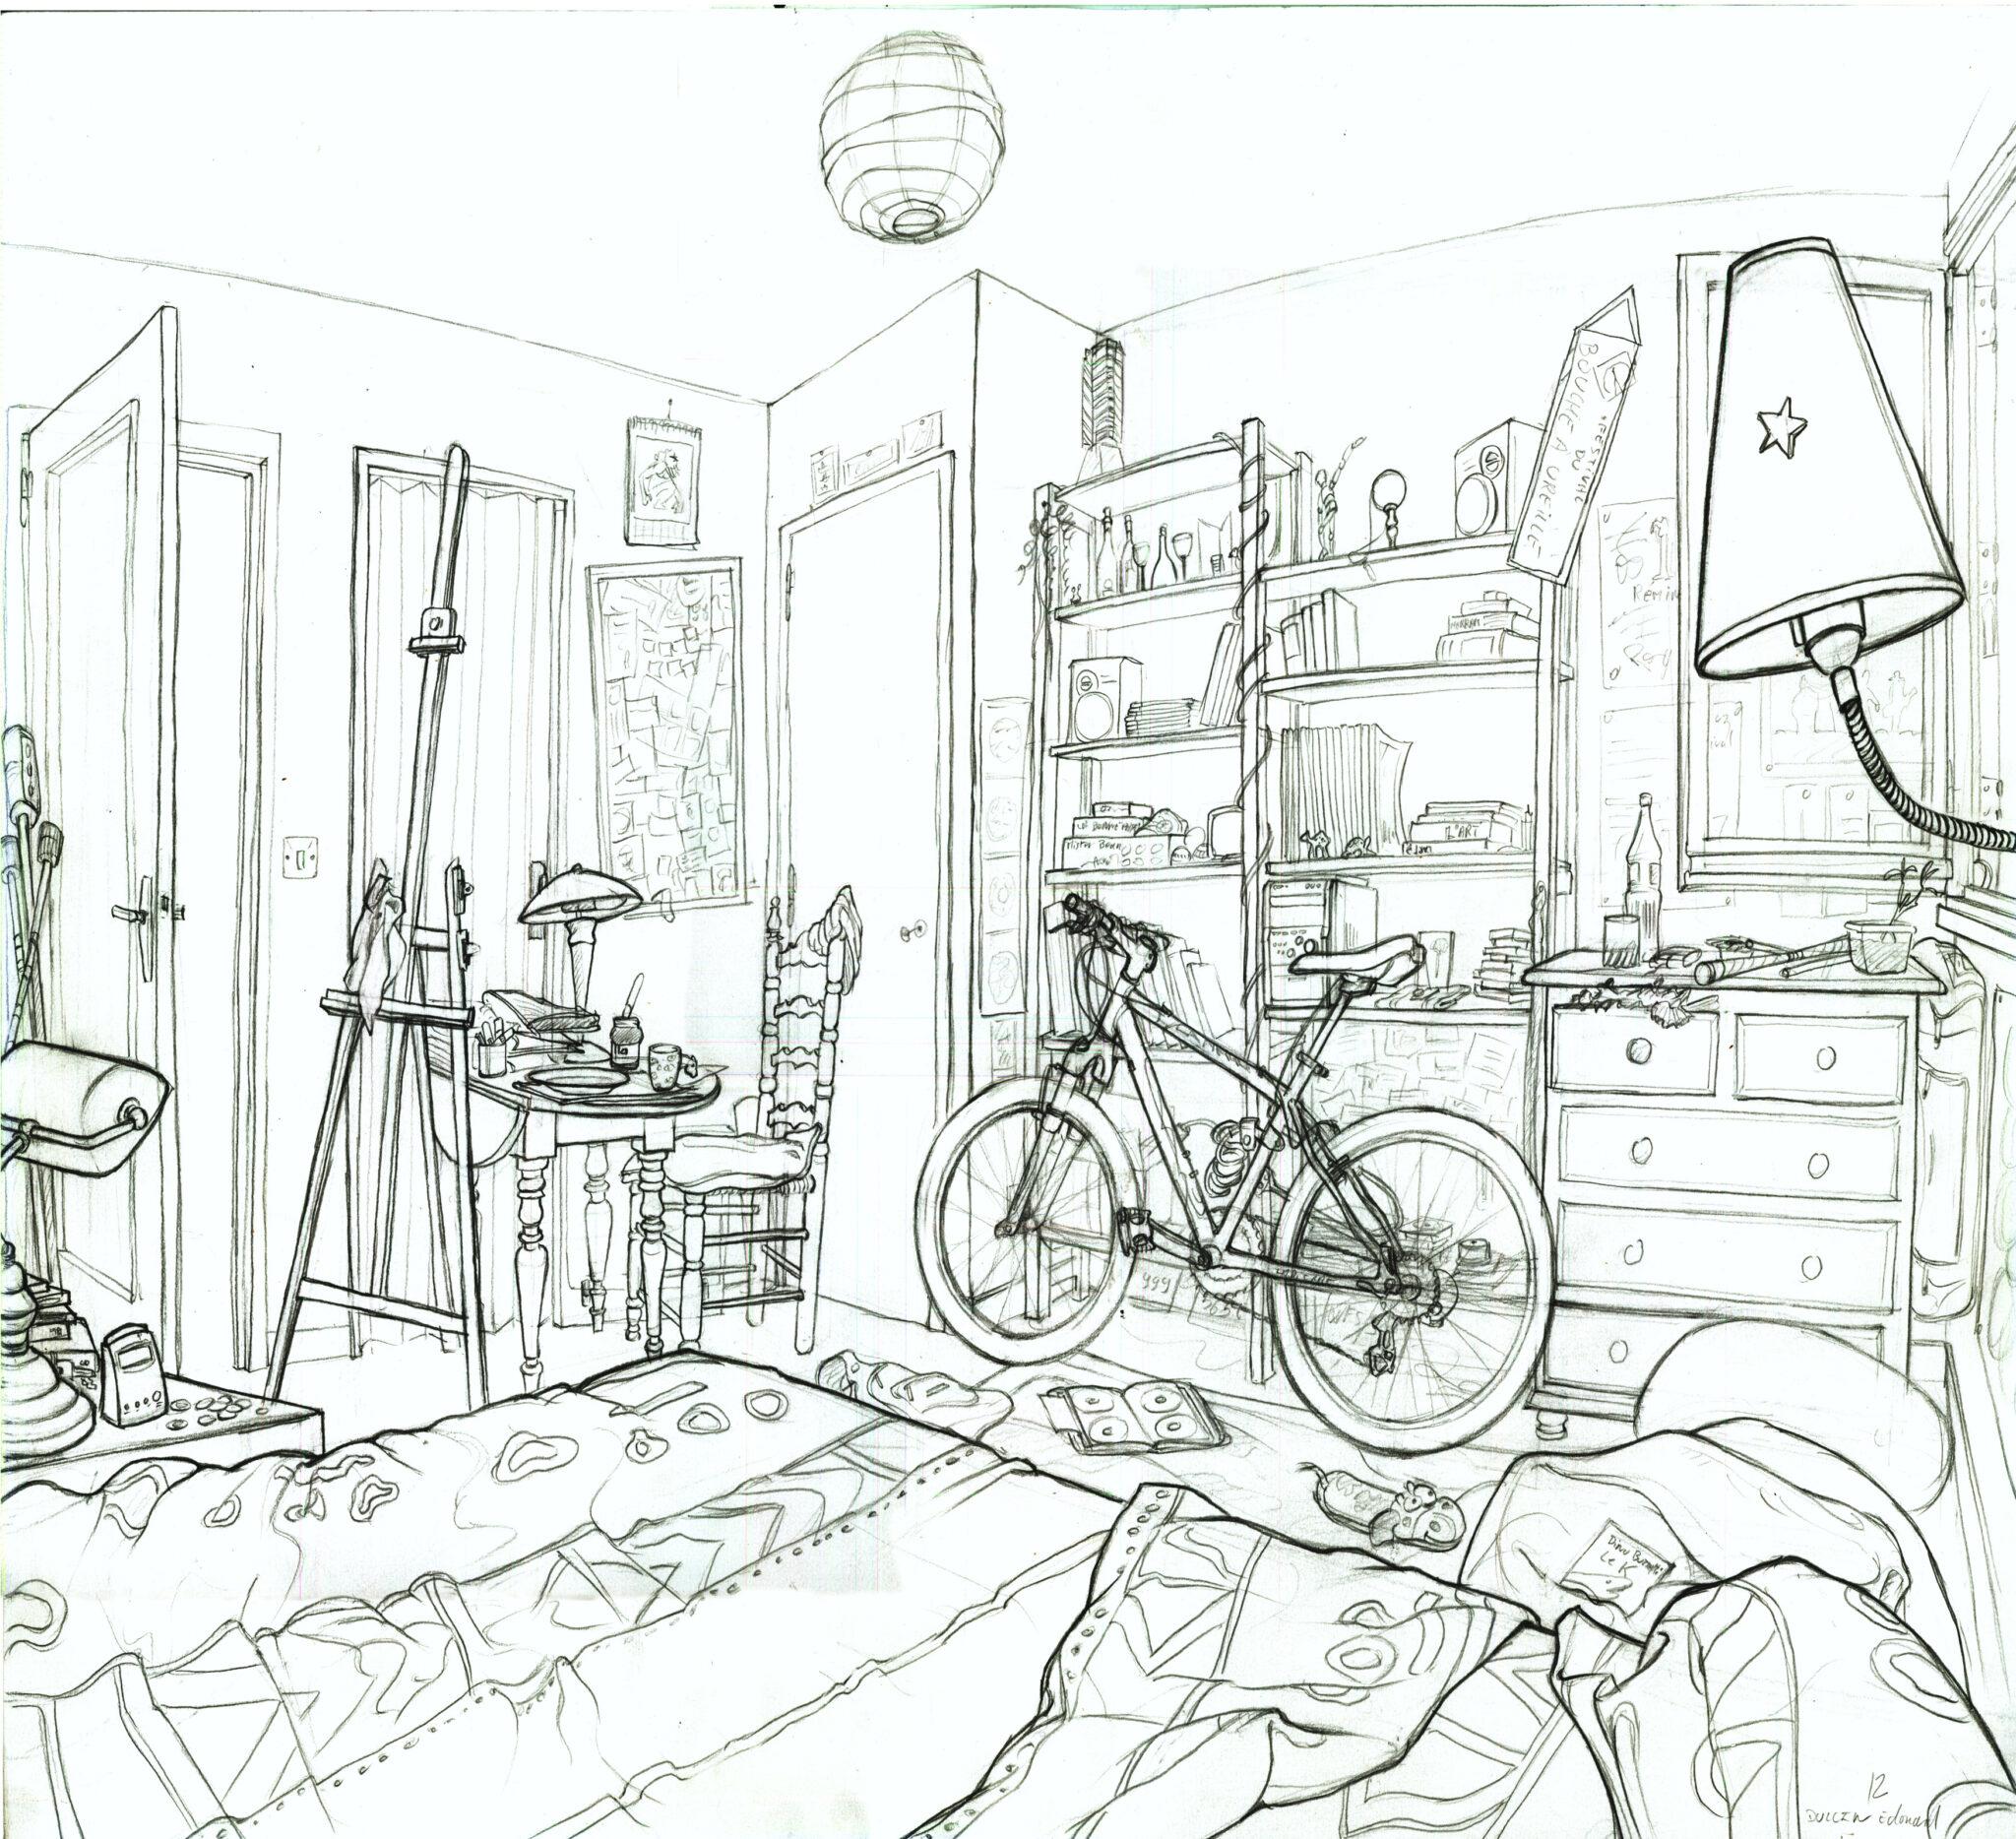 Croquis de ma chambre (crayon)